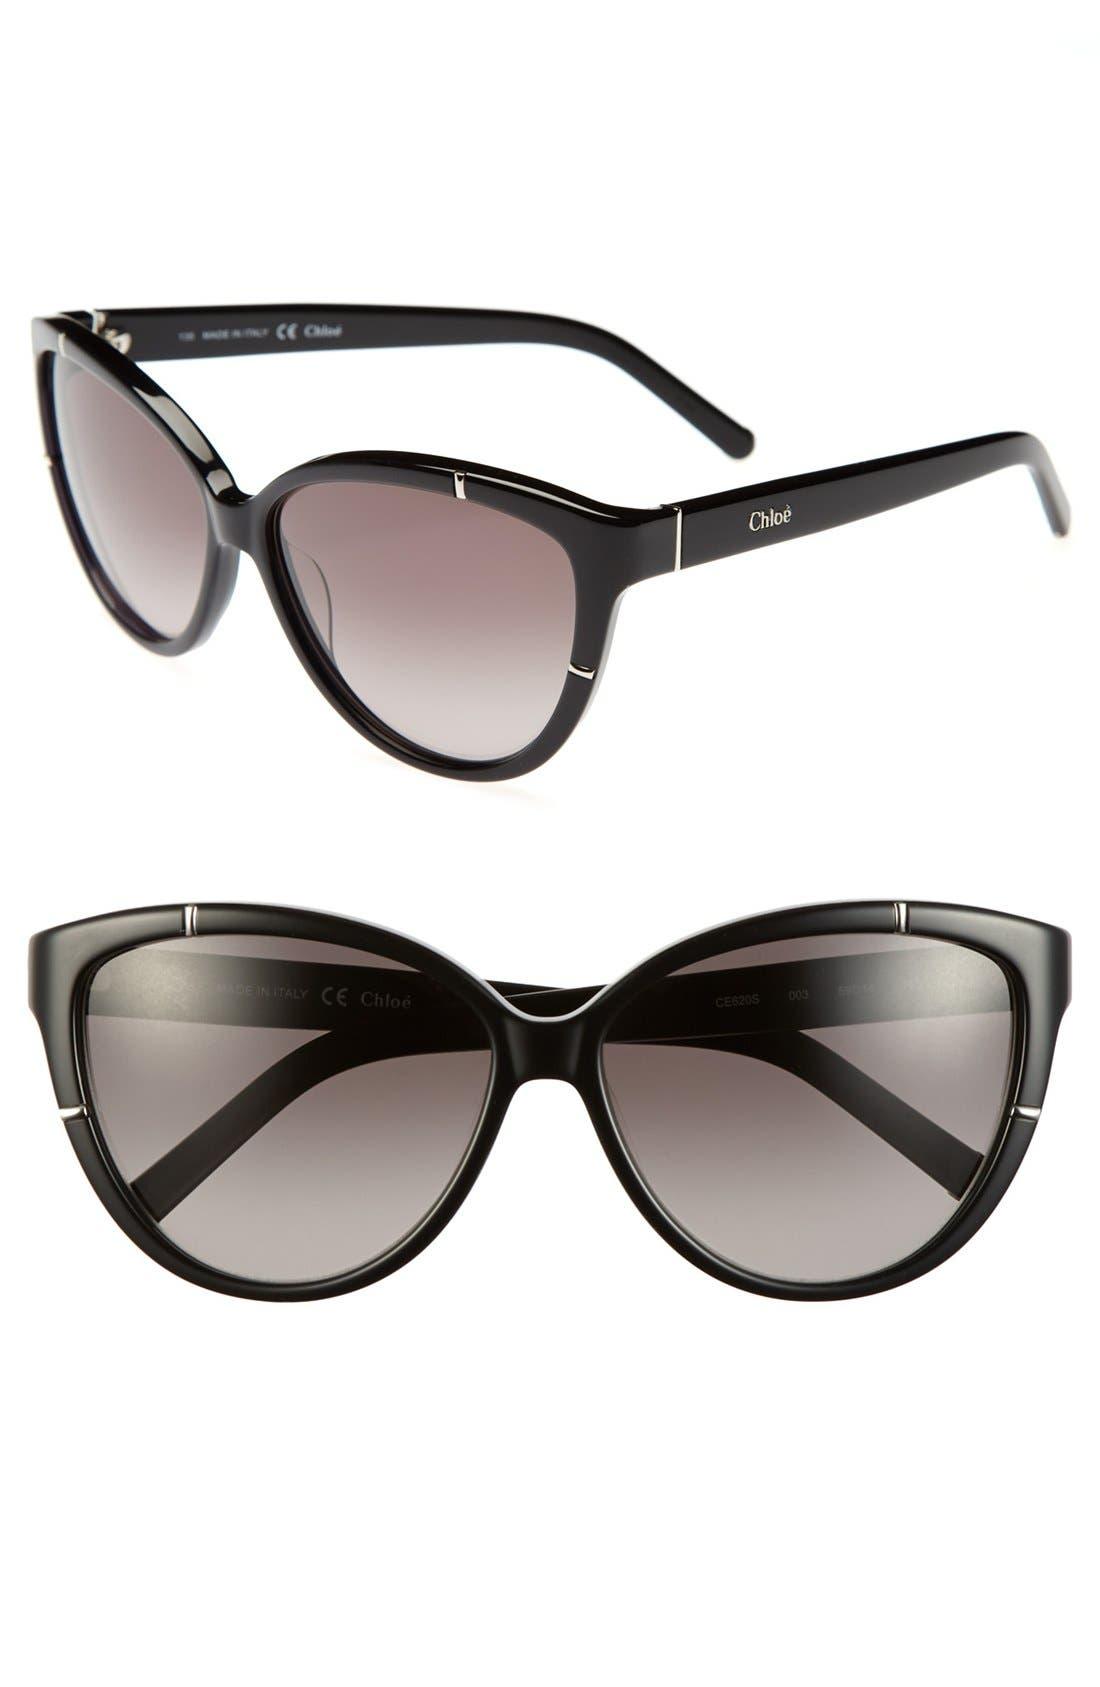 Alternate Image 1 Selected - Chloé 'Caspia' 59mm Sunglasses